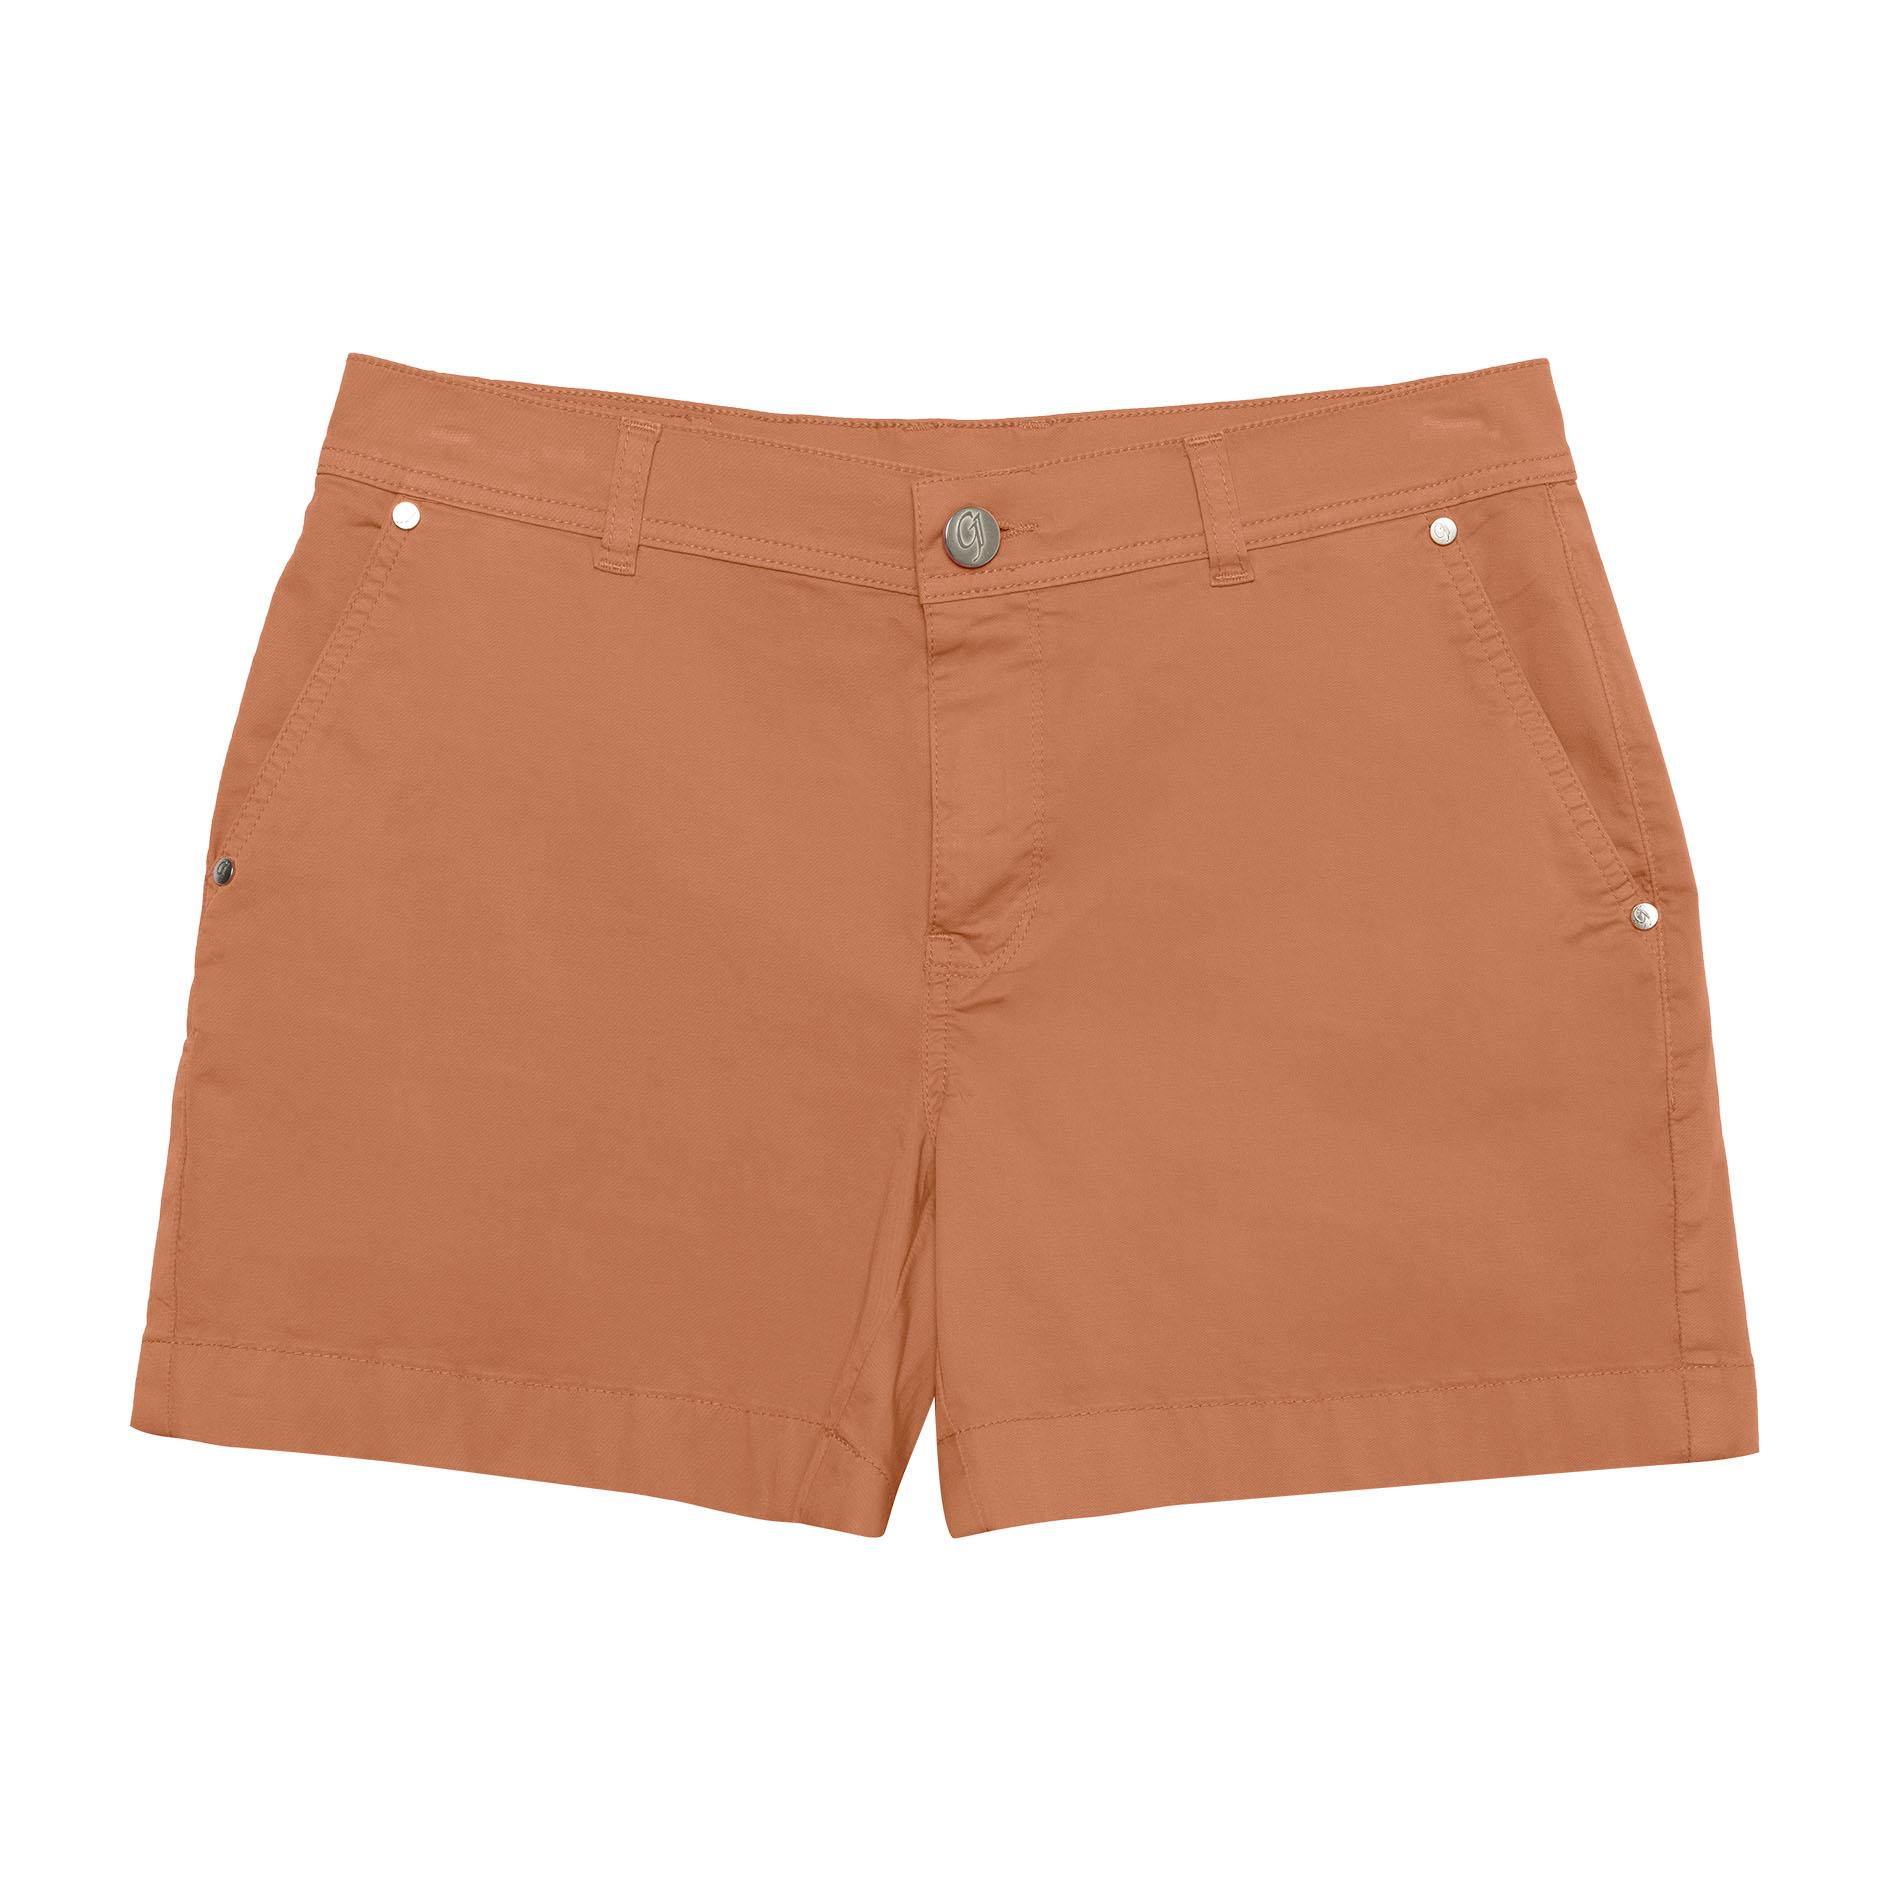 Short 'Ernest' Peach